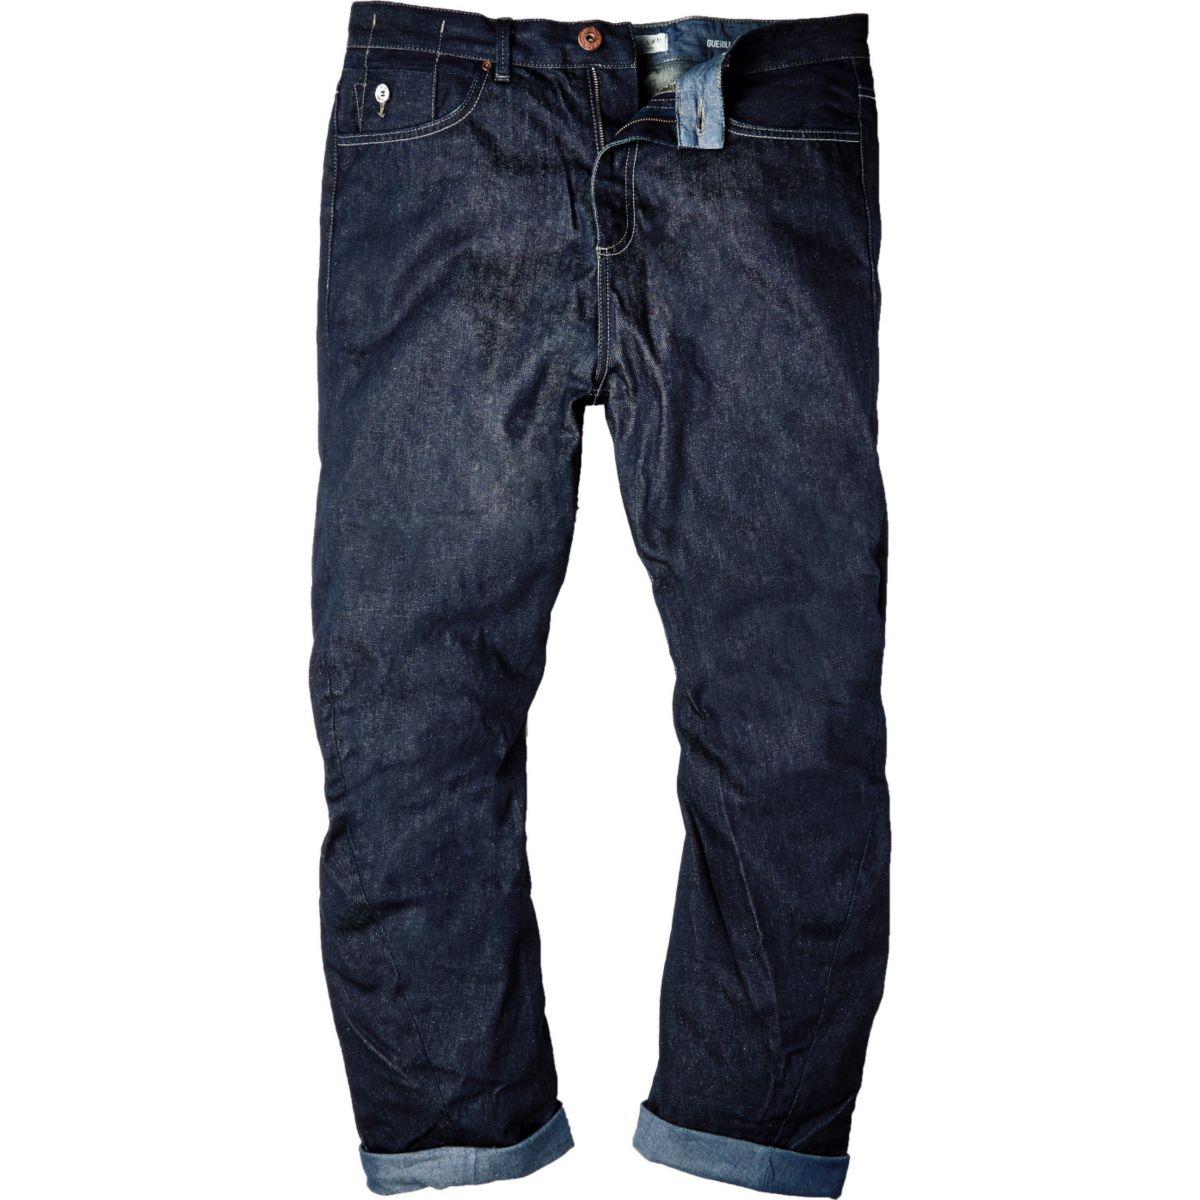 Dark blue wash slouchy fit jeans